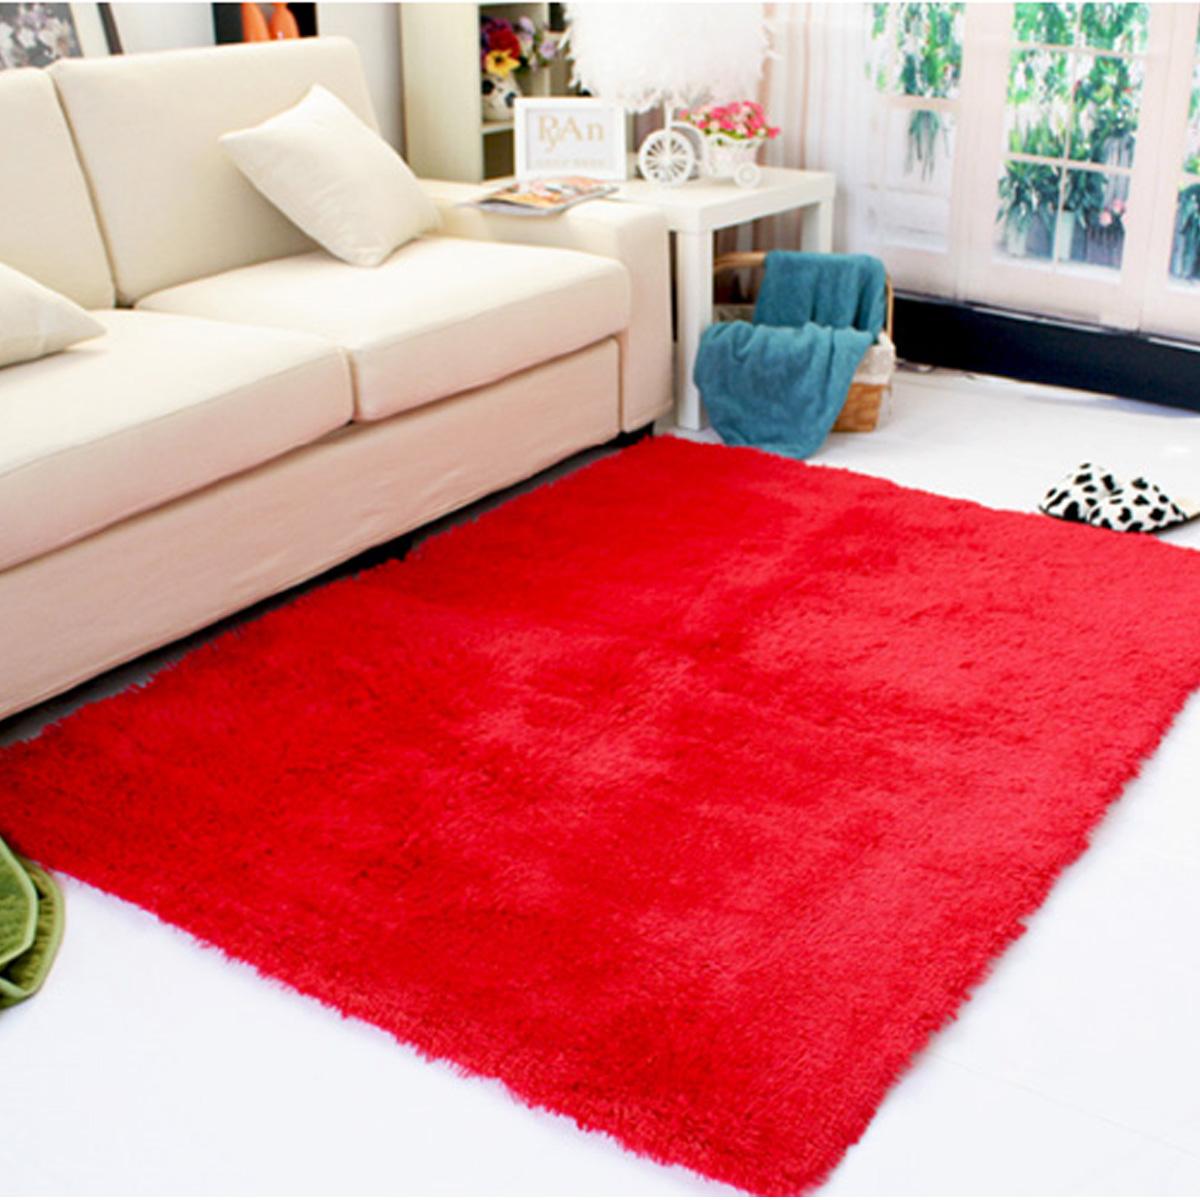 13 Colors 4 Sizes Modern Soft Fluffy Floor Rug Anti Skid